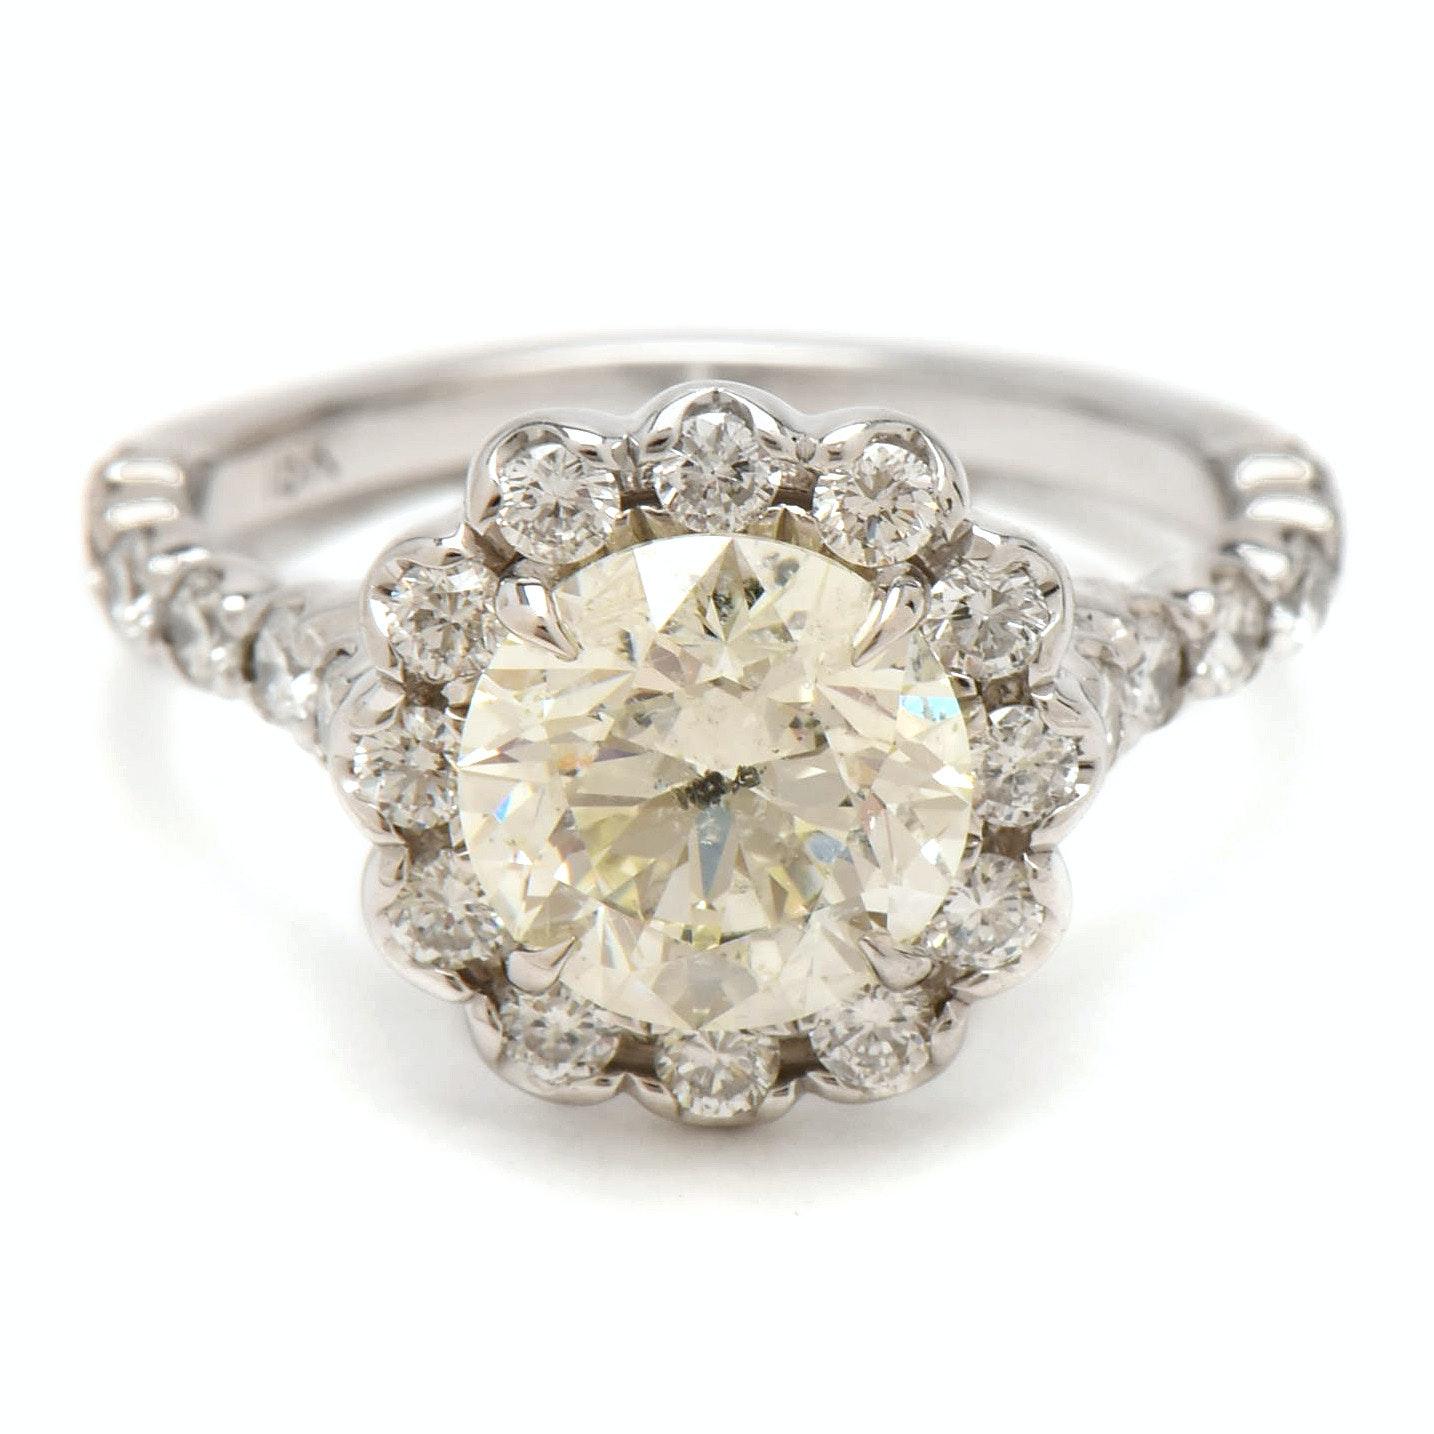 18K White Gold 2.22 CTW Diamond Ring